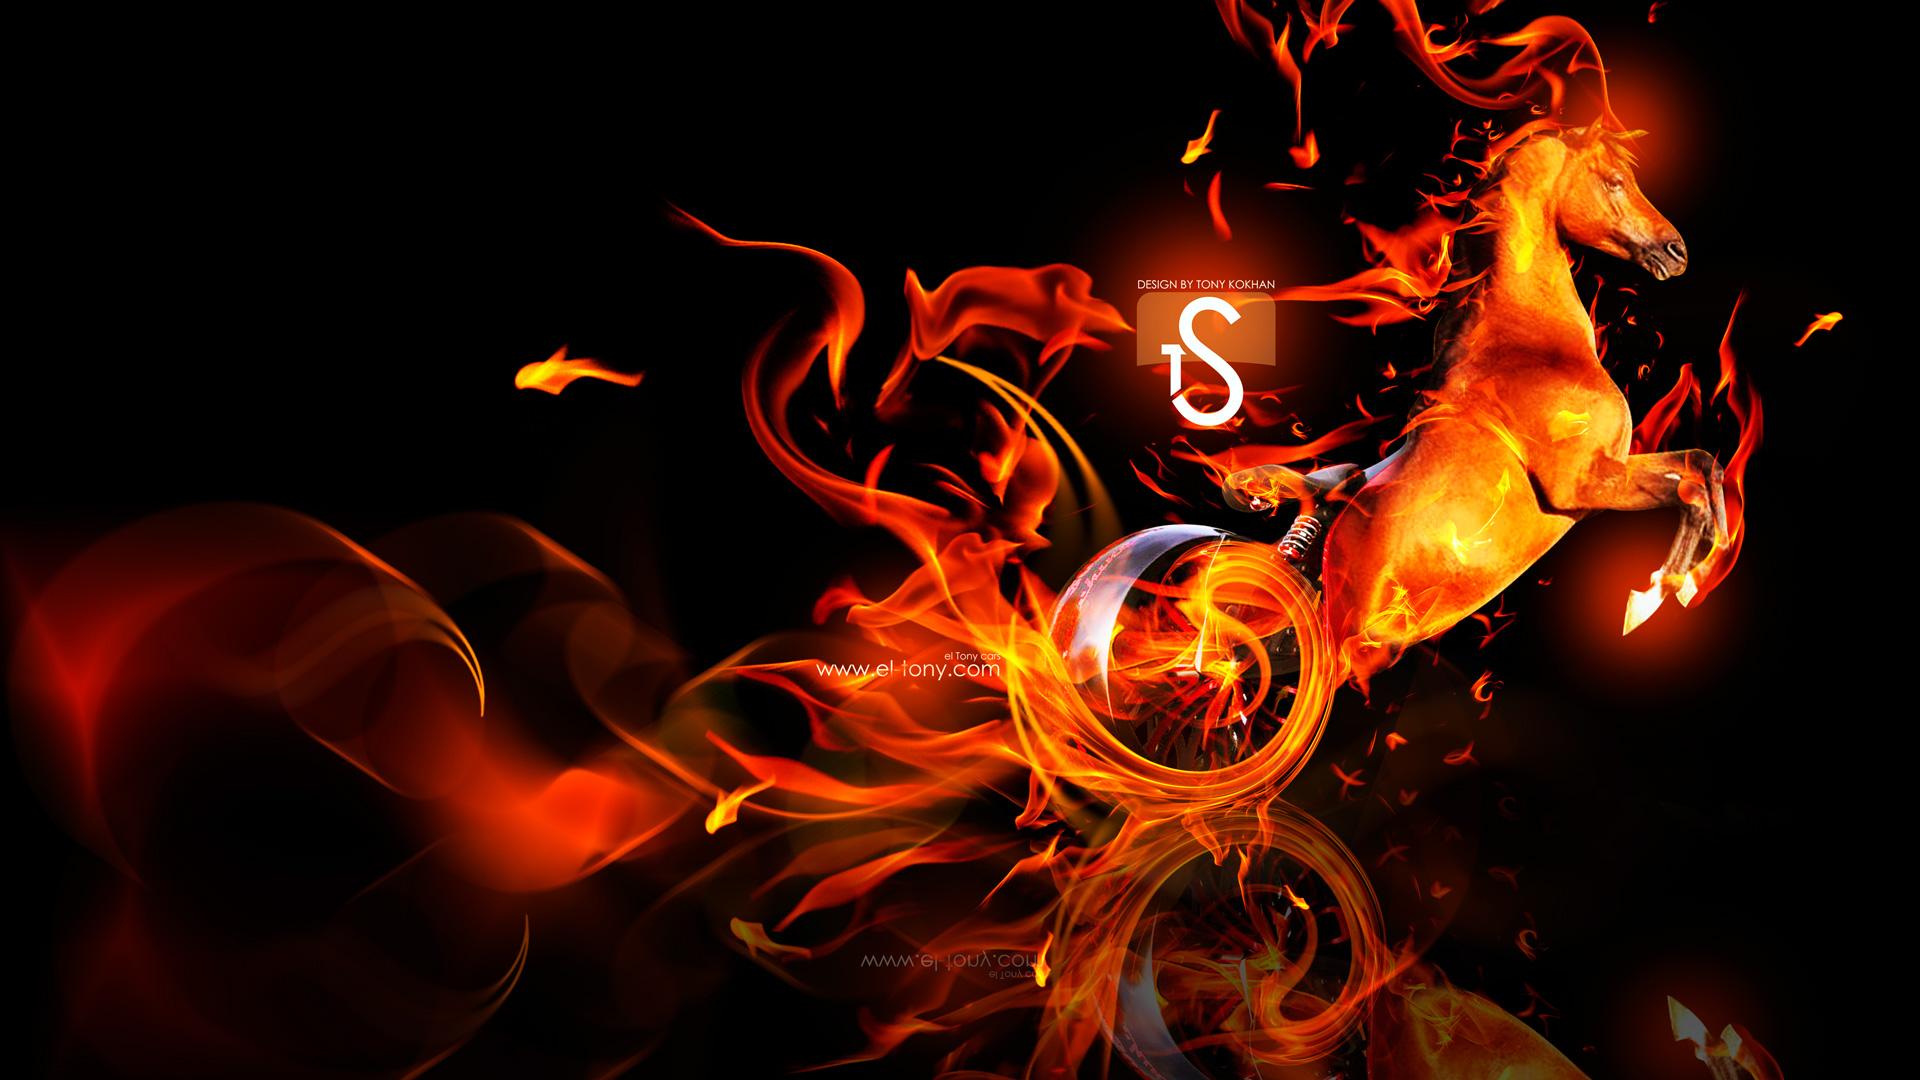 Fantasy Fire Moto Horse 2014 Fire Horses 1893366 Hd Wallpaper Backgrounds Download